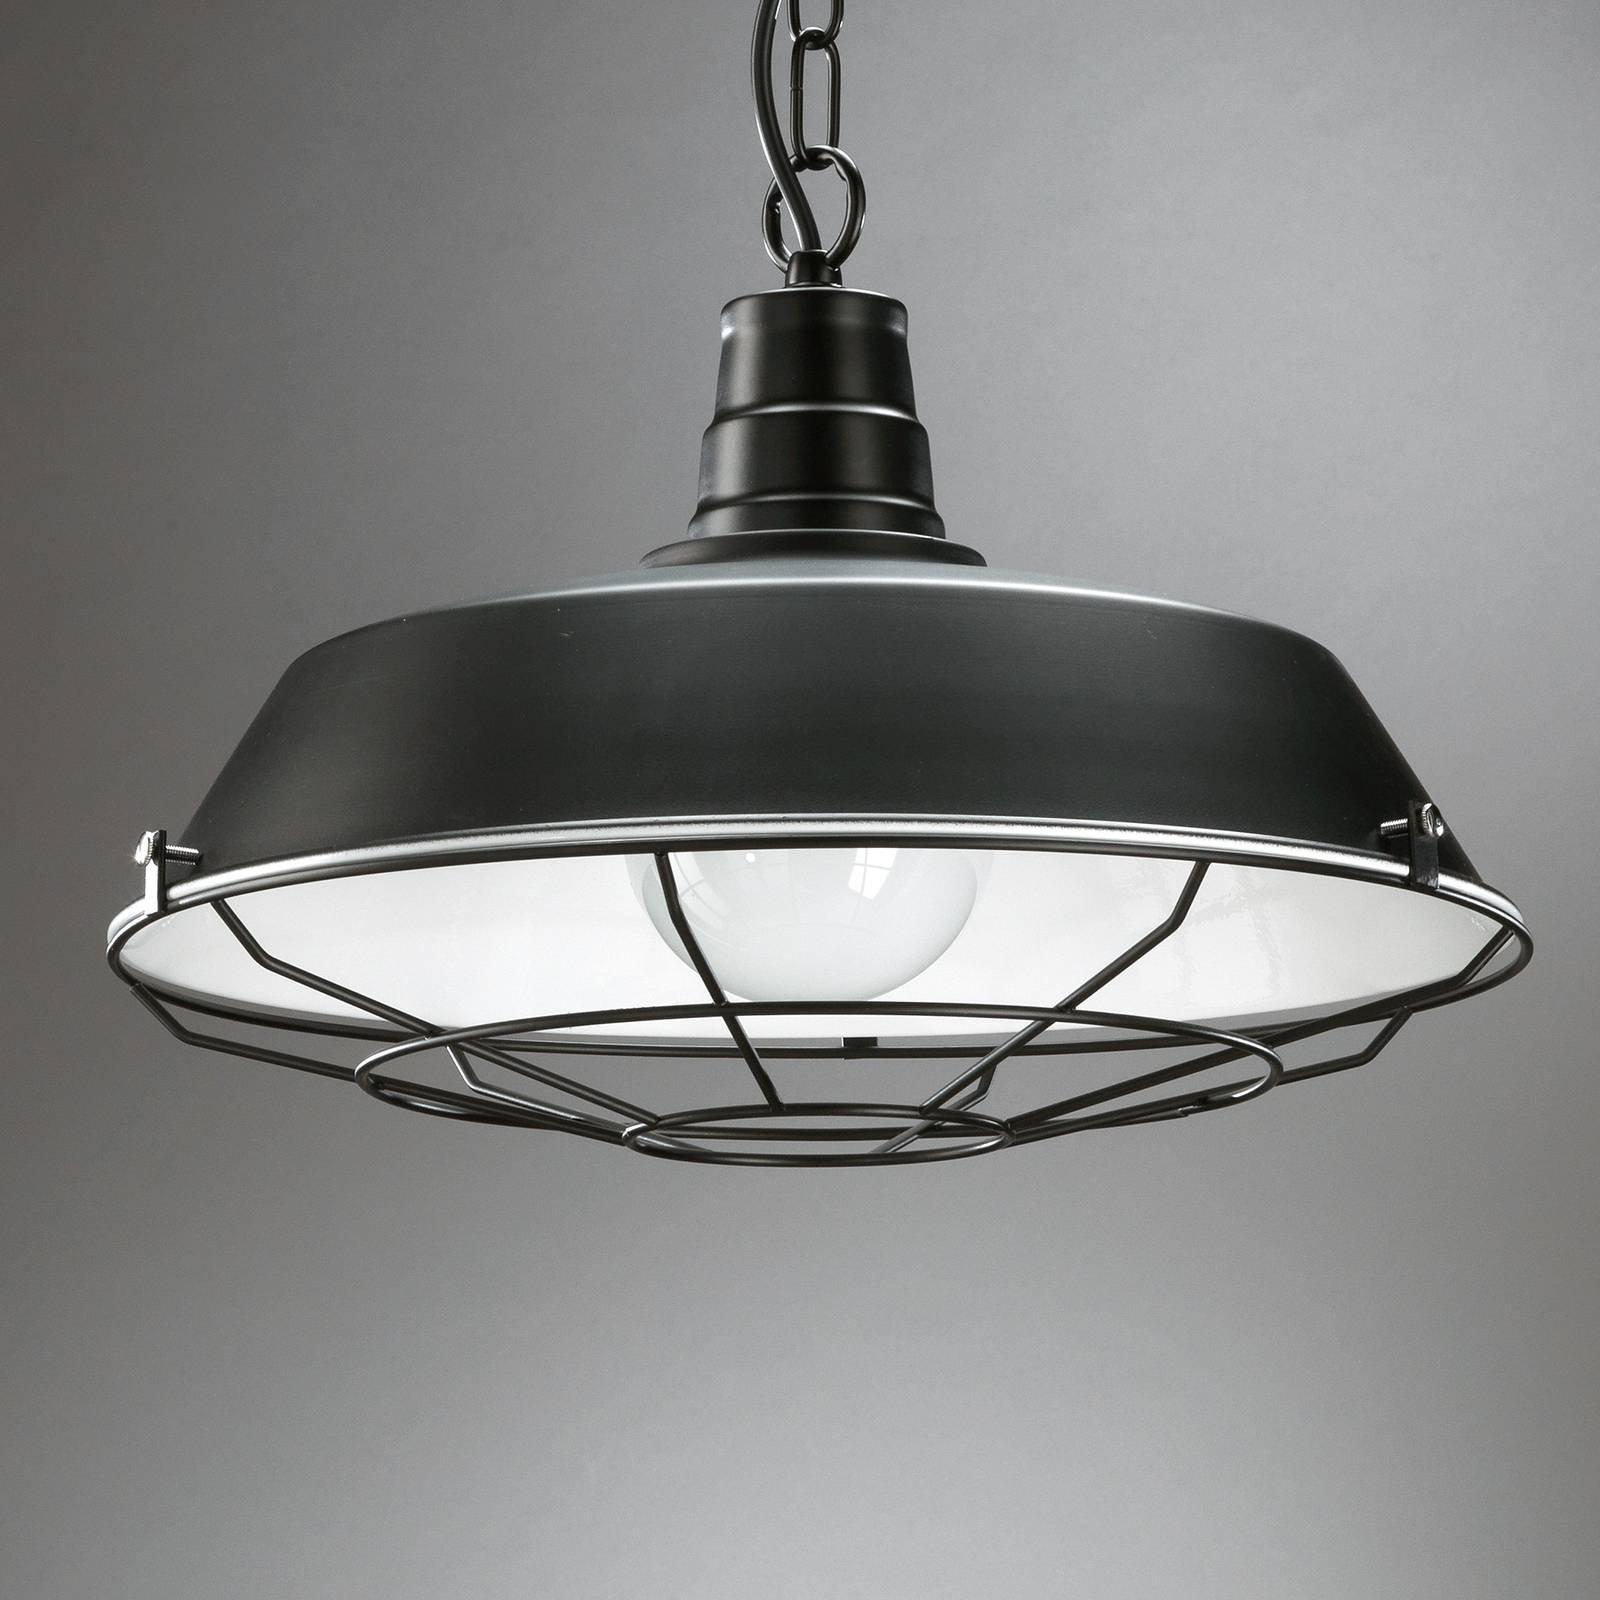 Grill hanging light  metal with lattice  black